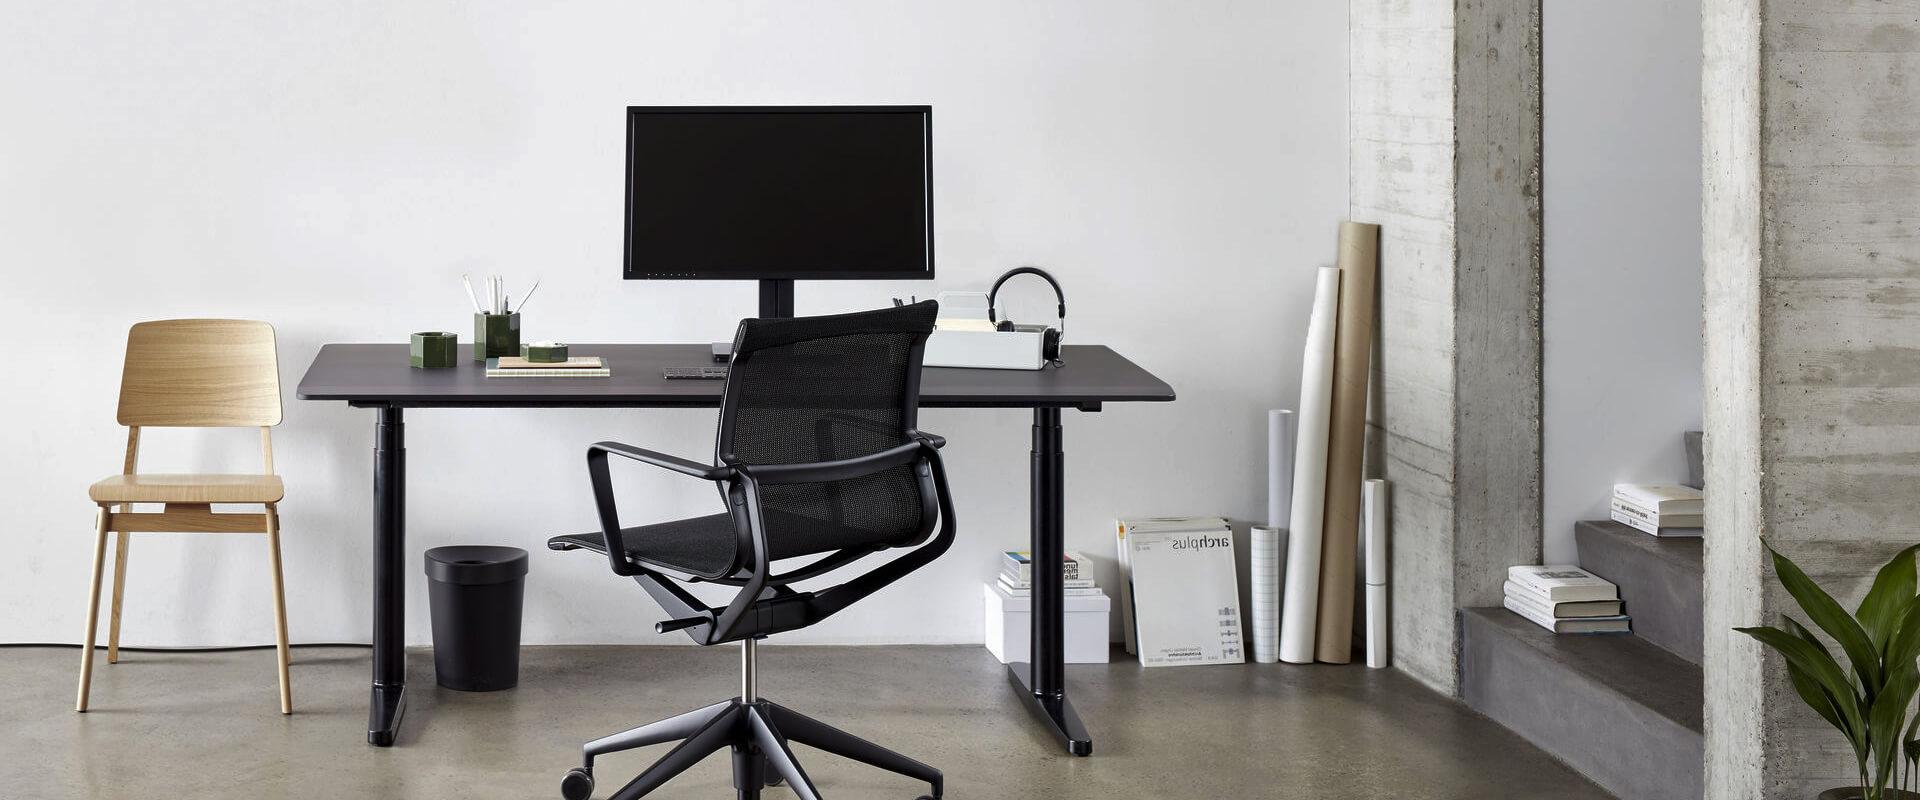 Vitra home office